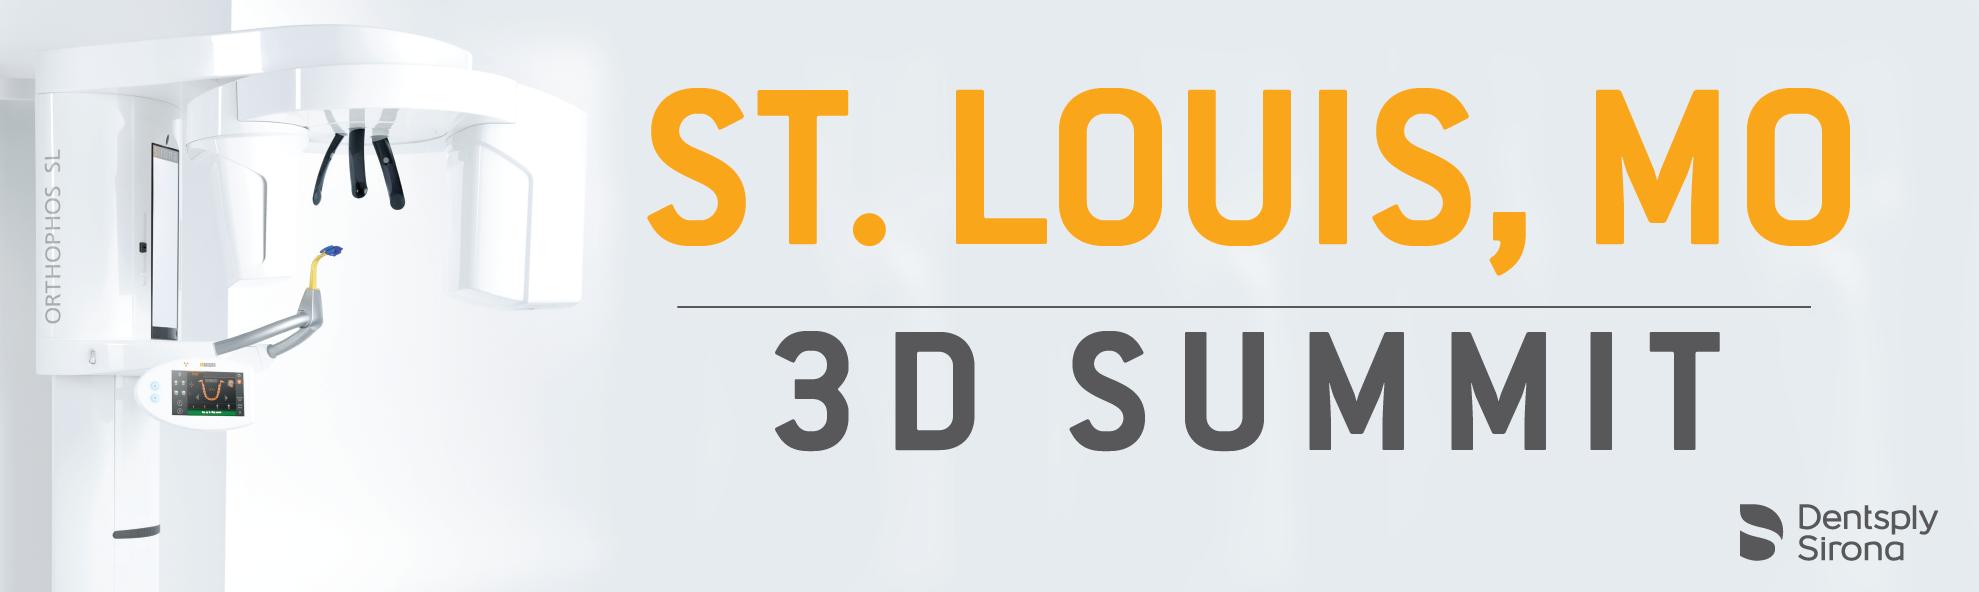 St. Louis 3D Summit